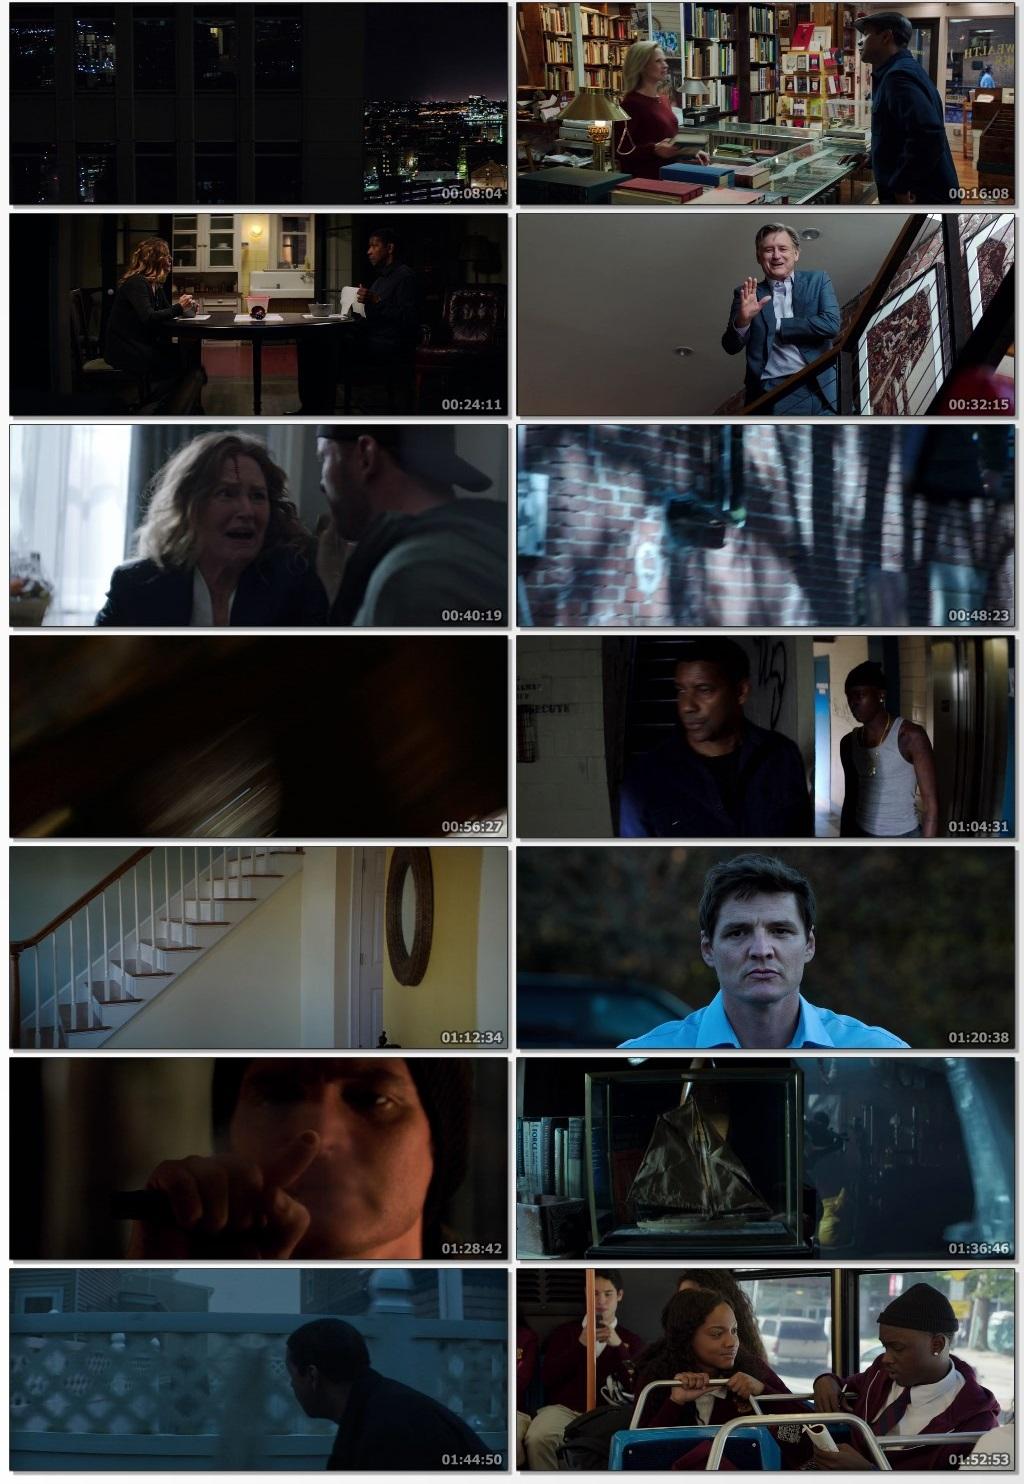 The-Equalizer-2-2018-www-1kmovies-cyou-Hindi-Dual-Audio-720p-Blu-Ray-ESubs-1-2-GB-mkv-thumbs